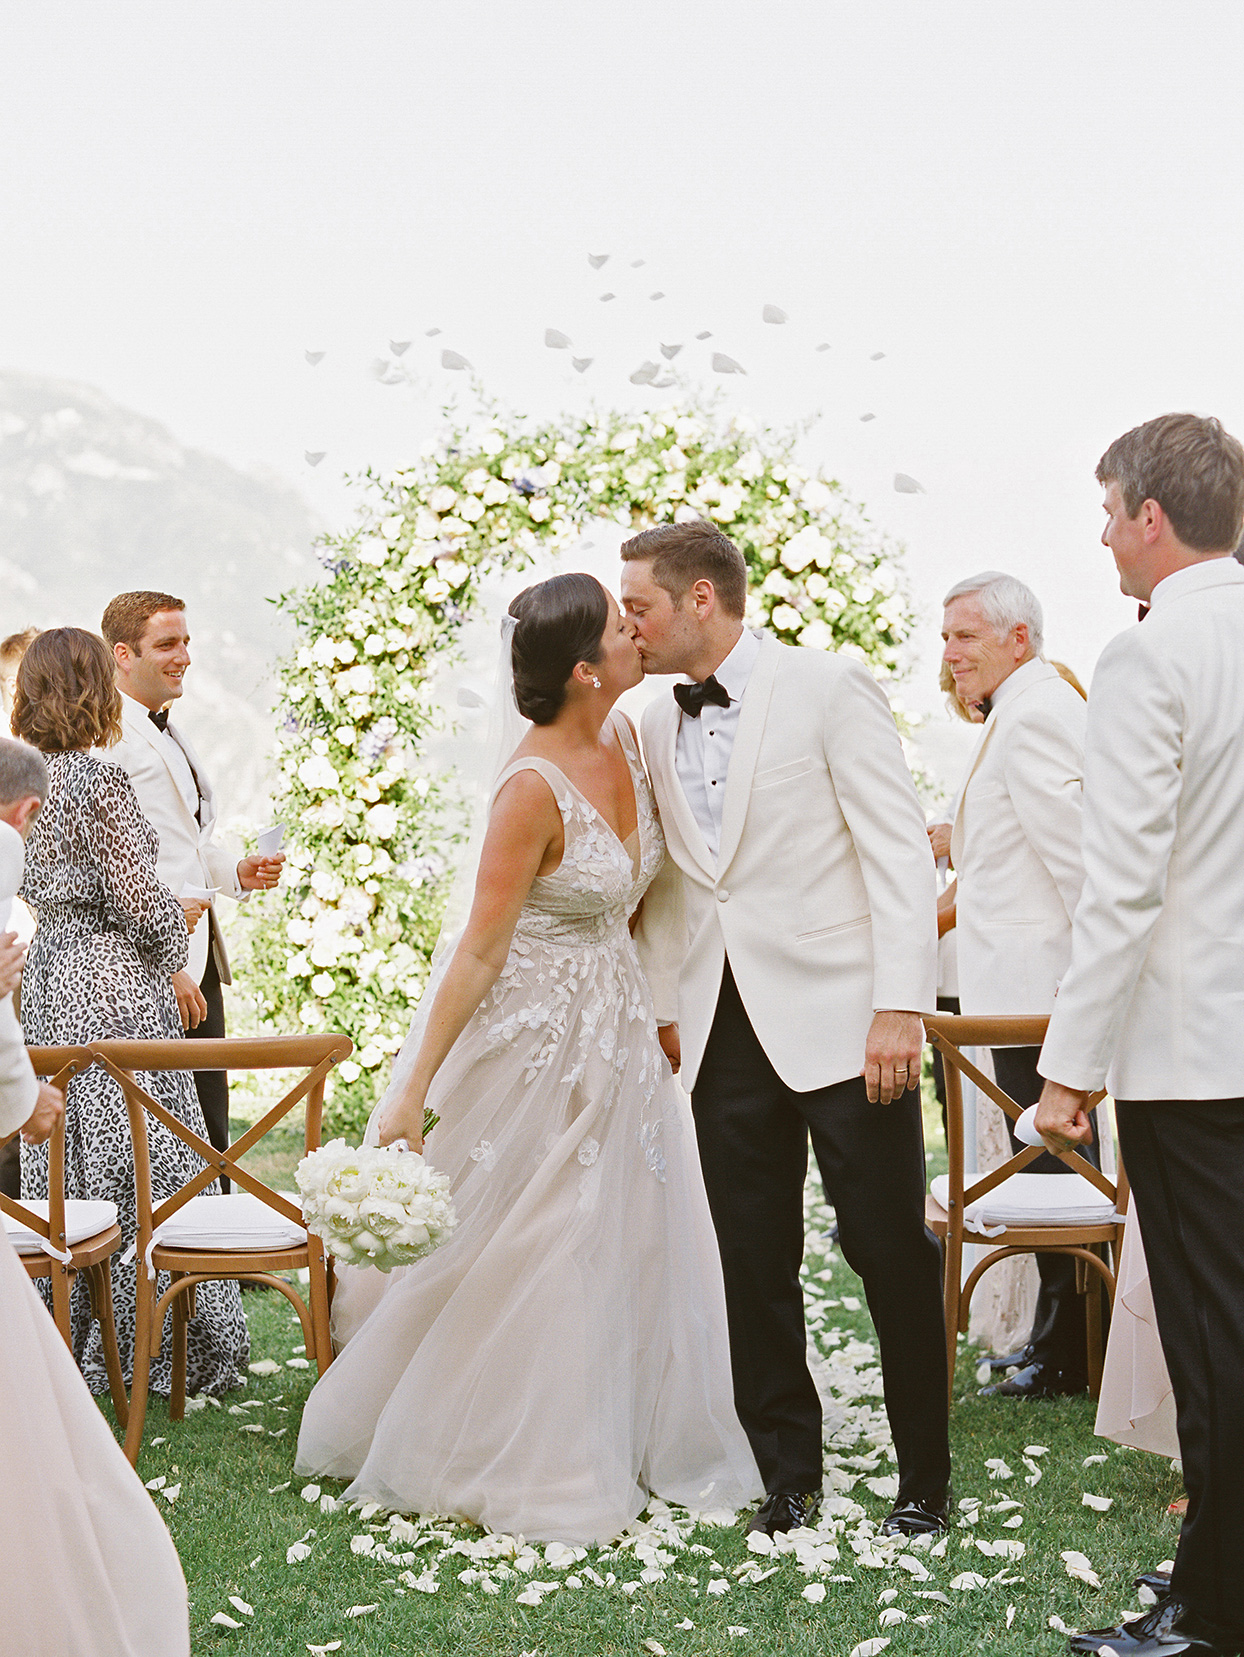 jacqueline david wedding ceremony couple kiss